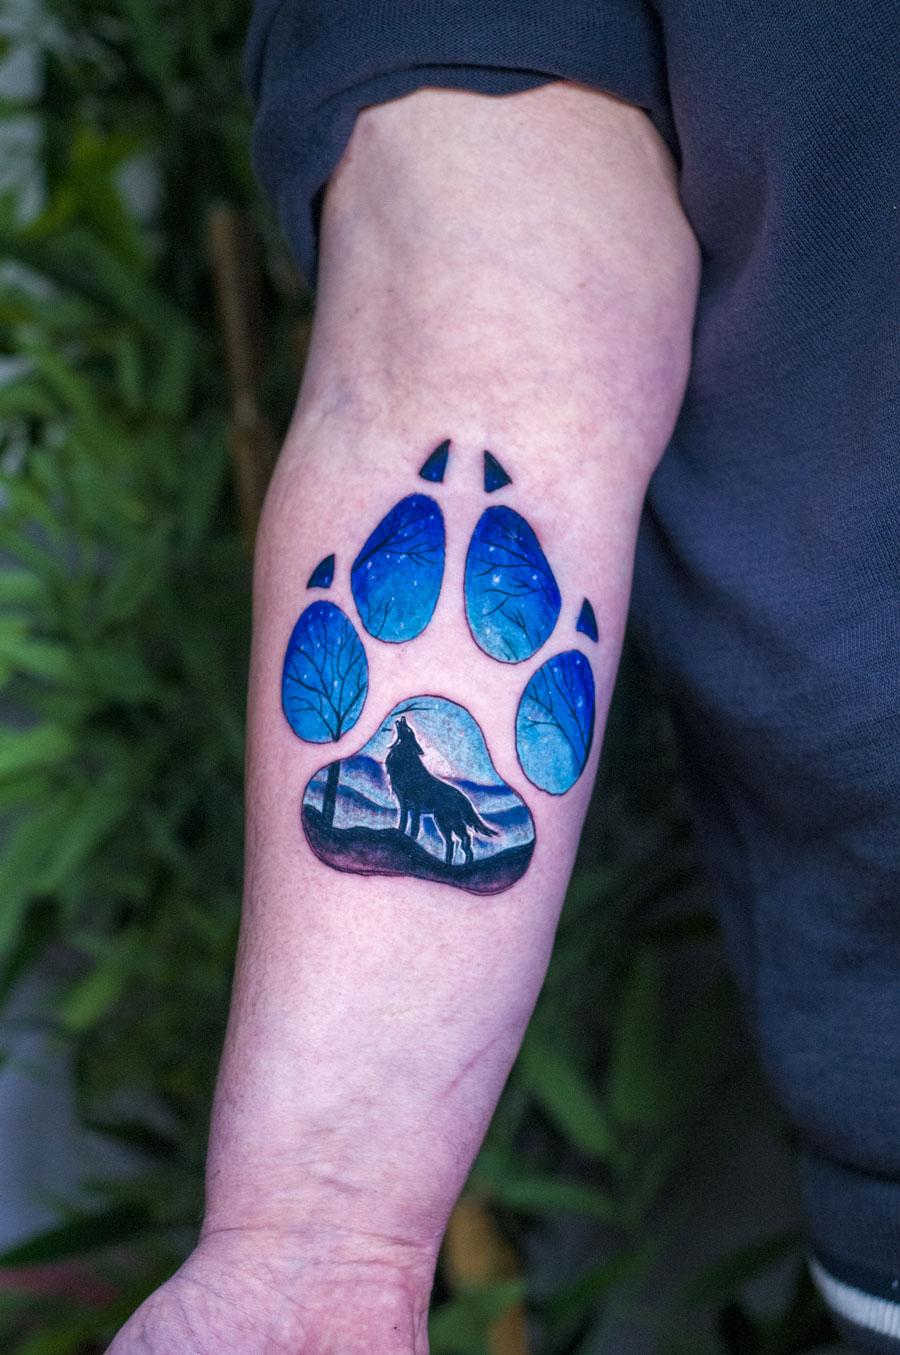 dog paw with wolf טביעת כף רגל זאב כלב נוף כחול